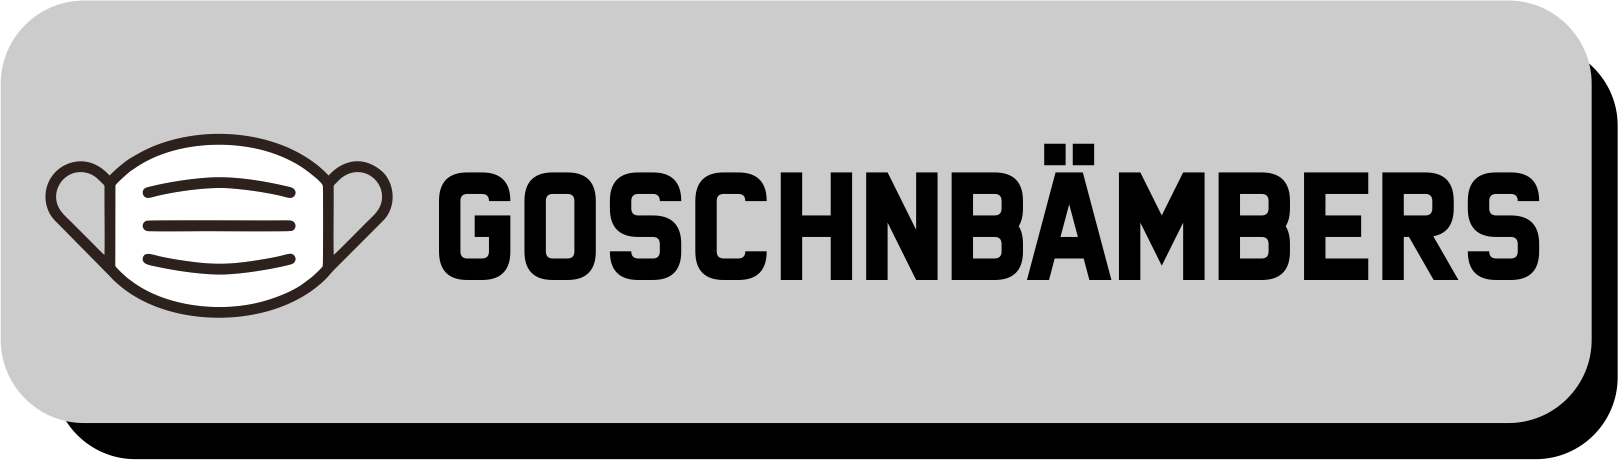 Goschnbämbers